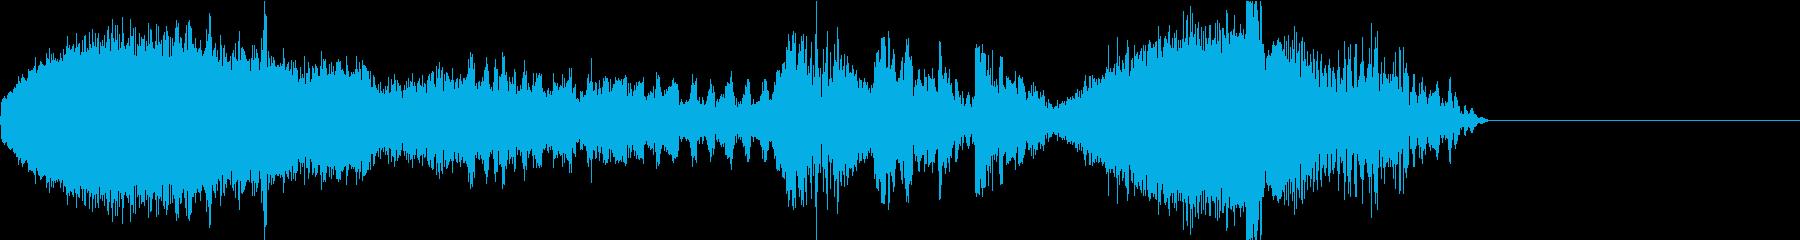 FMラジオ的ジングル7の再生済みの波形